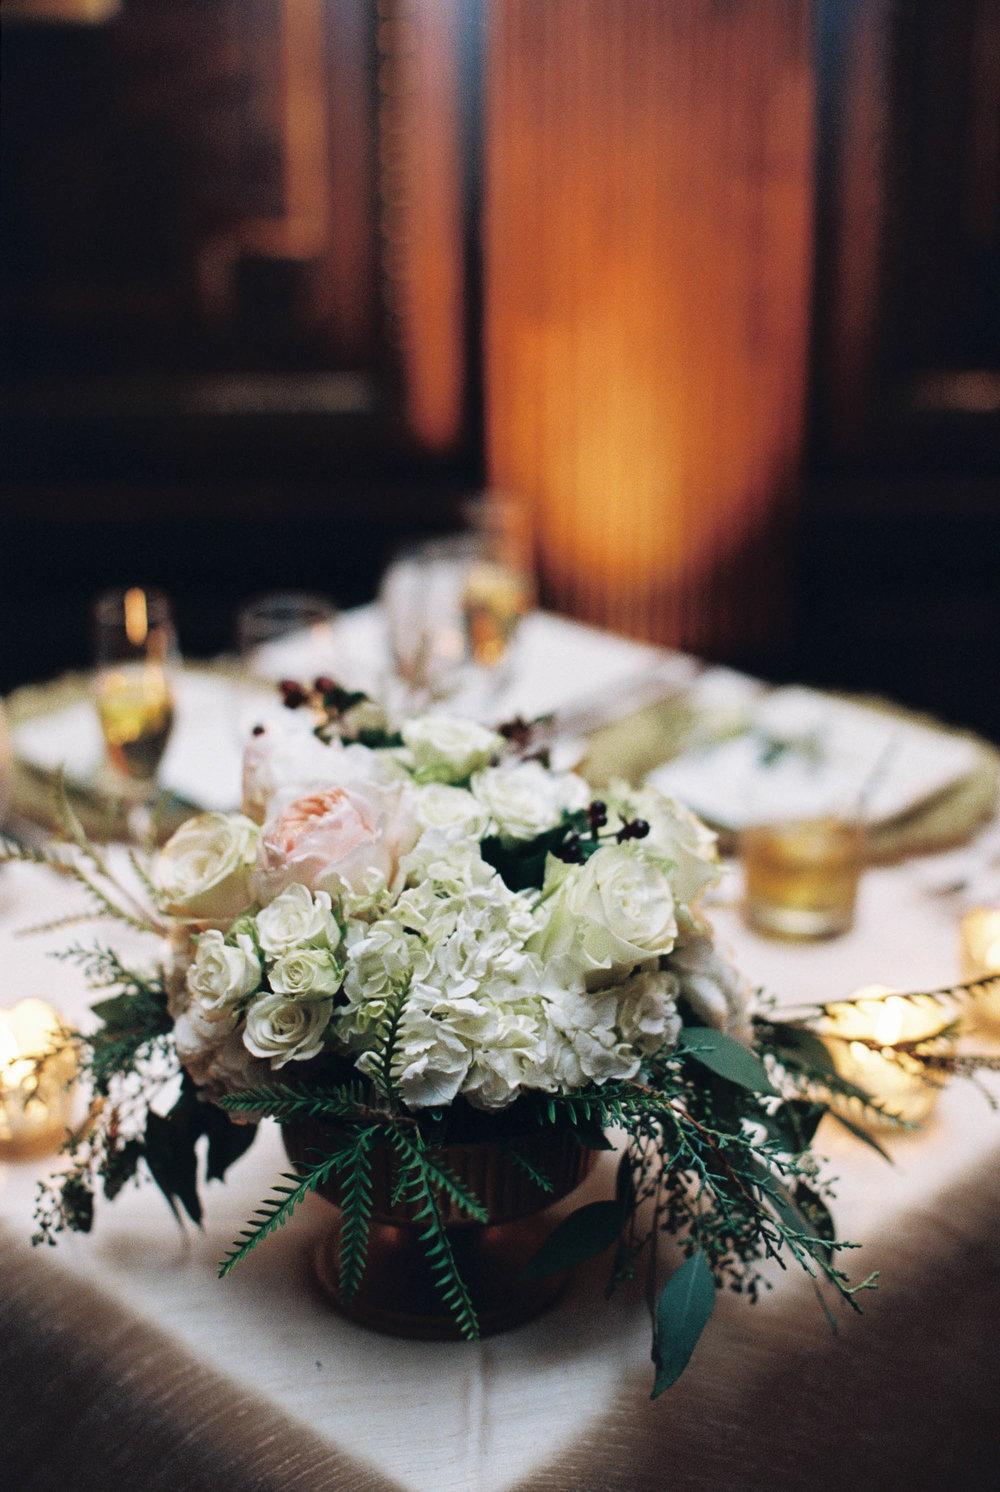 chris + jessica hermitage hotel wedding photographers nashville ©2017abigailbobophotography-25.jpg